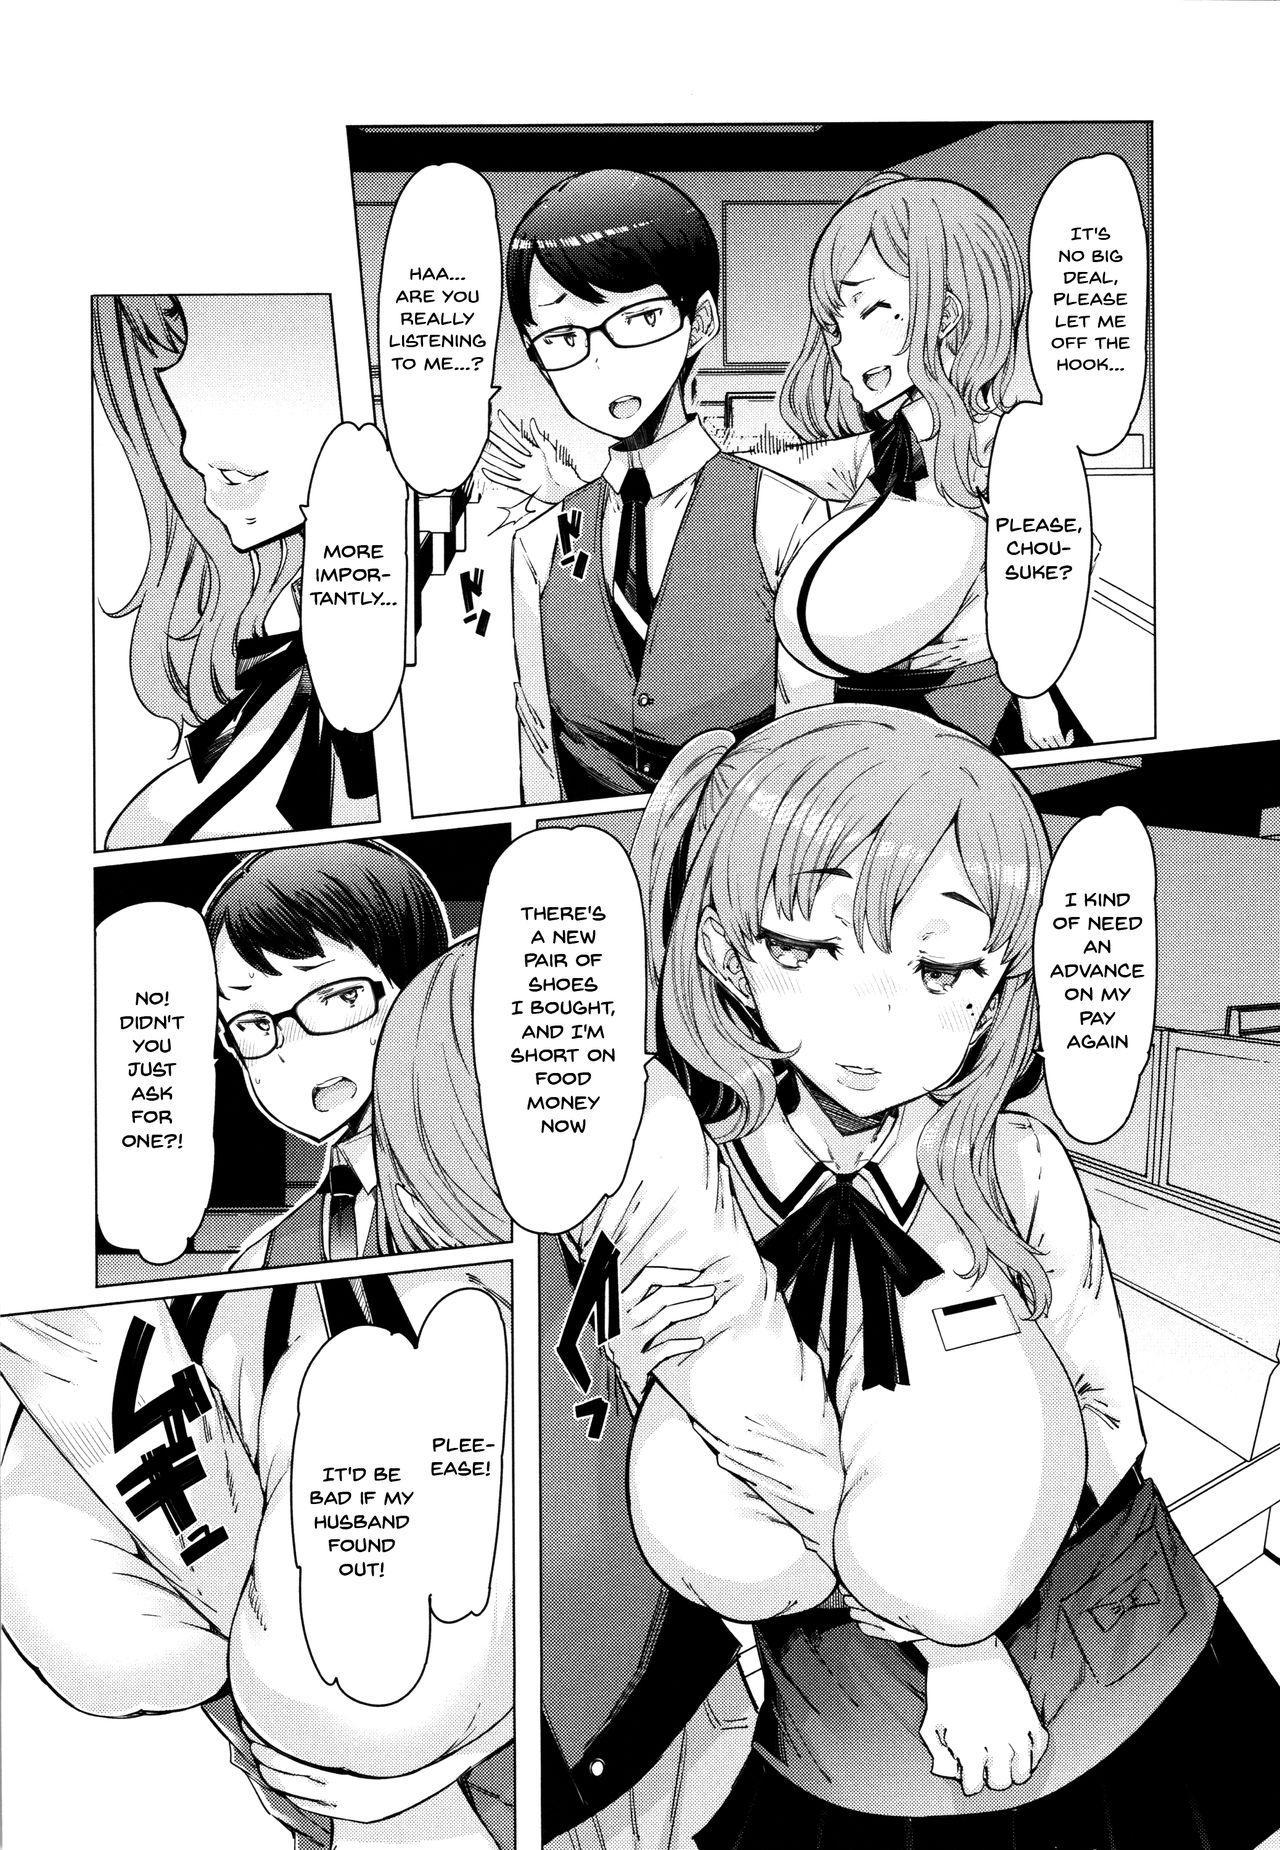 Hitozuma ga Ero Sugite Shigoto ni Naranai! | These Housewives Are Too Lewd I Can't Help It! Ch.1-7 7